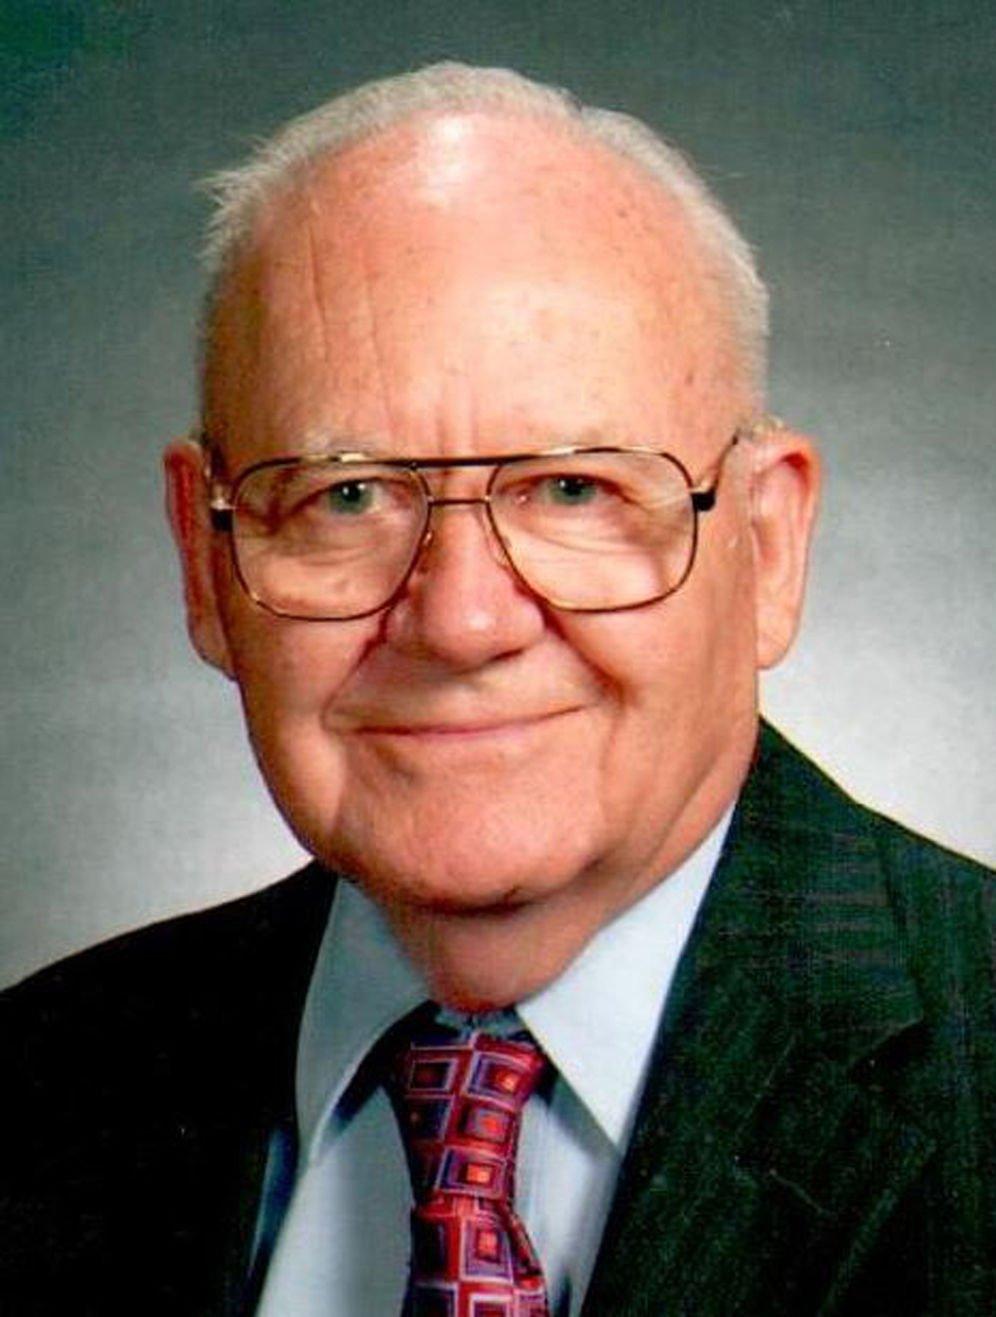 Keith Haist turns 95 February 6